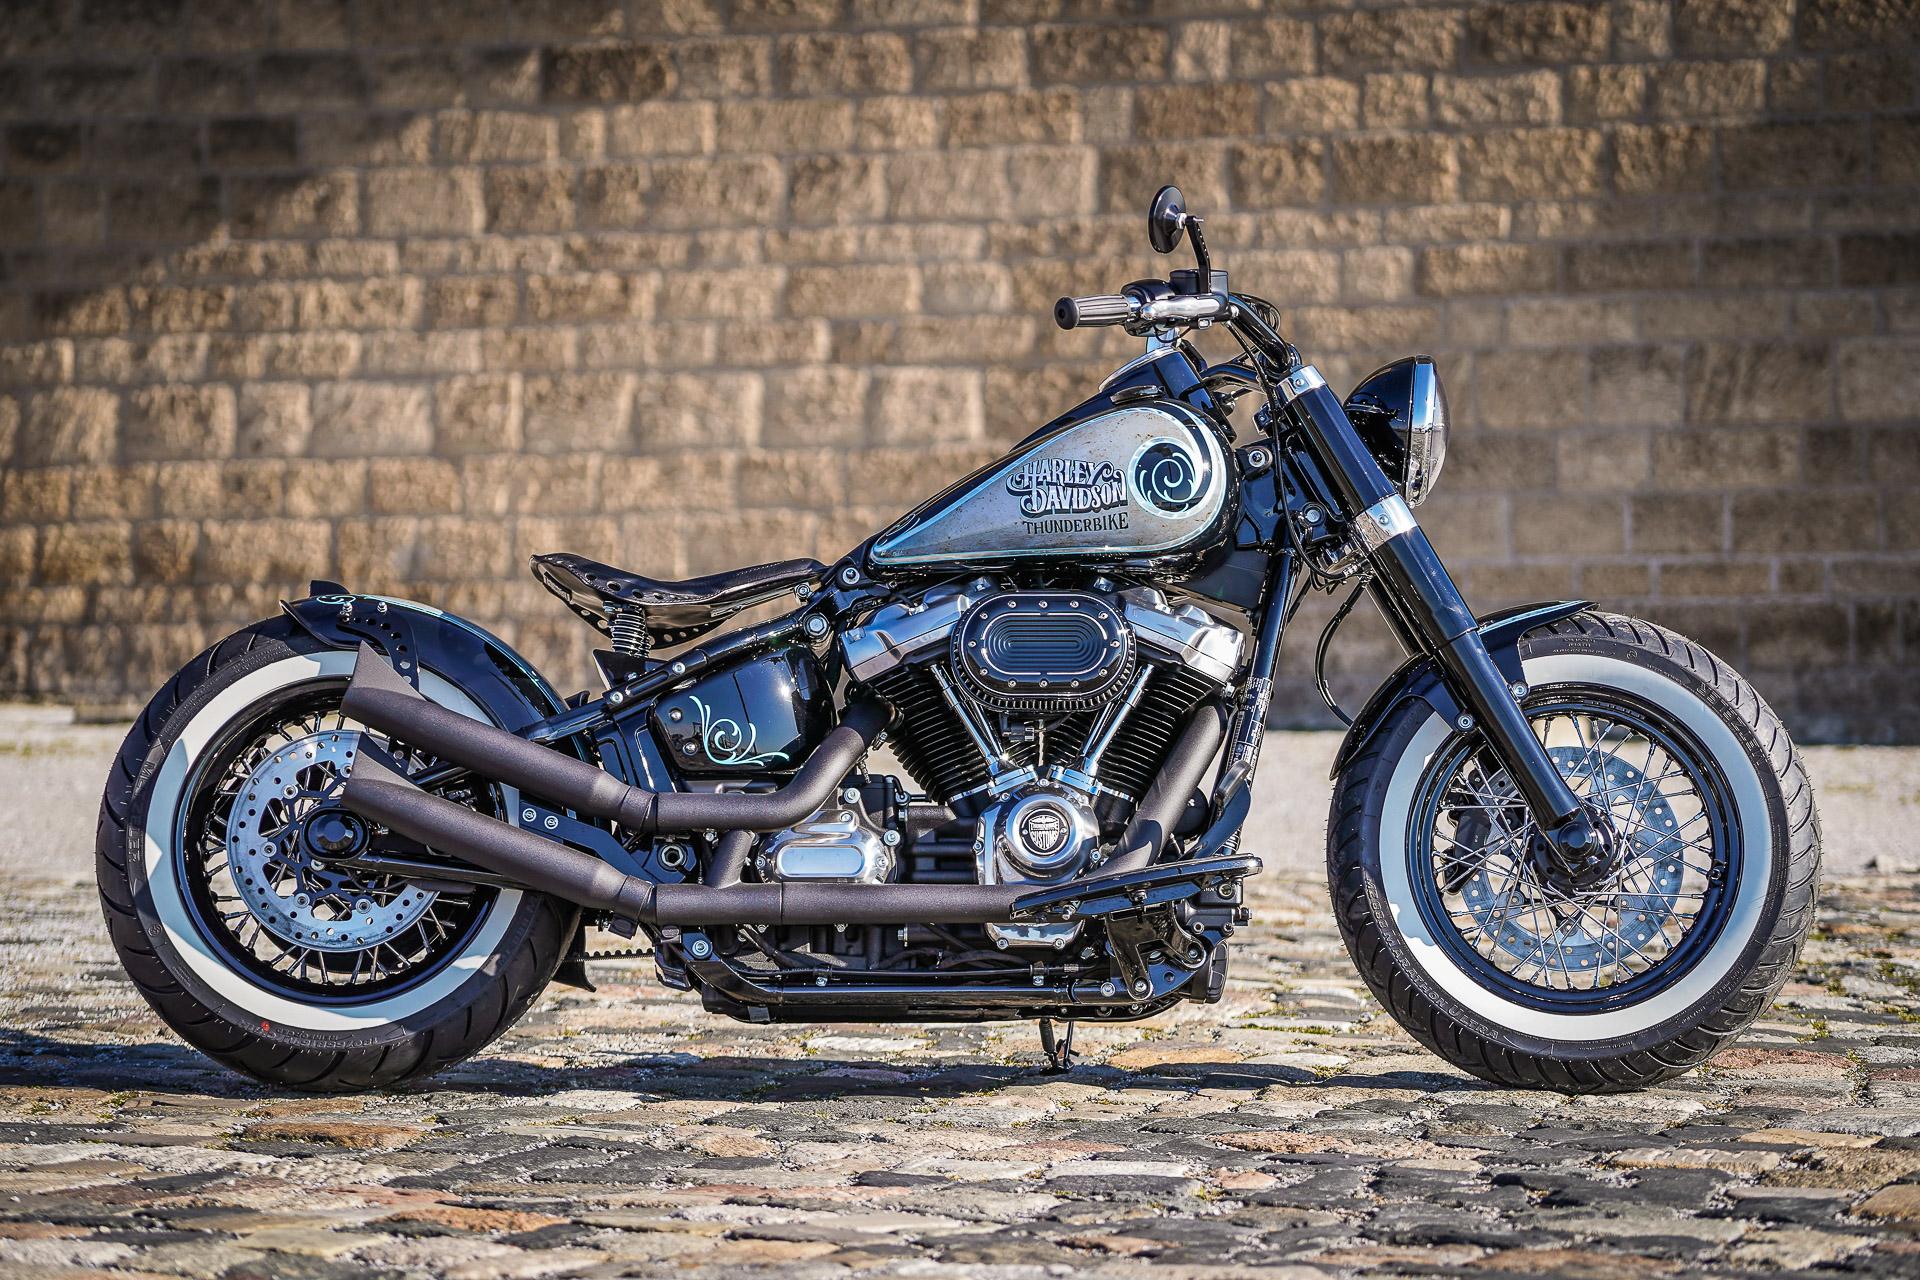 Used Harley Davidson Wheels >> Thunderbike Flying Joe • Custombike & Harley-Davidson Gallery